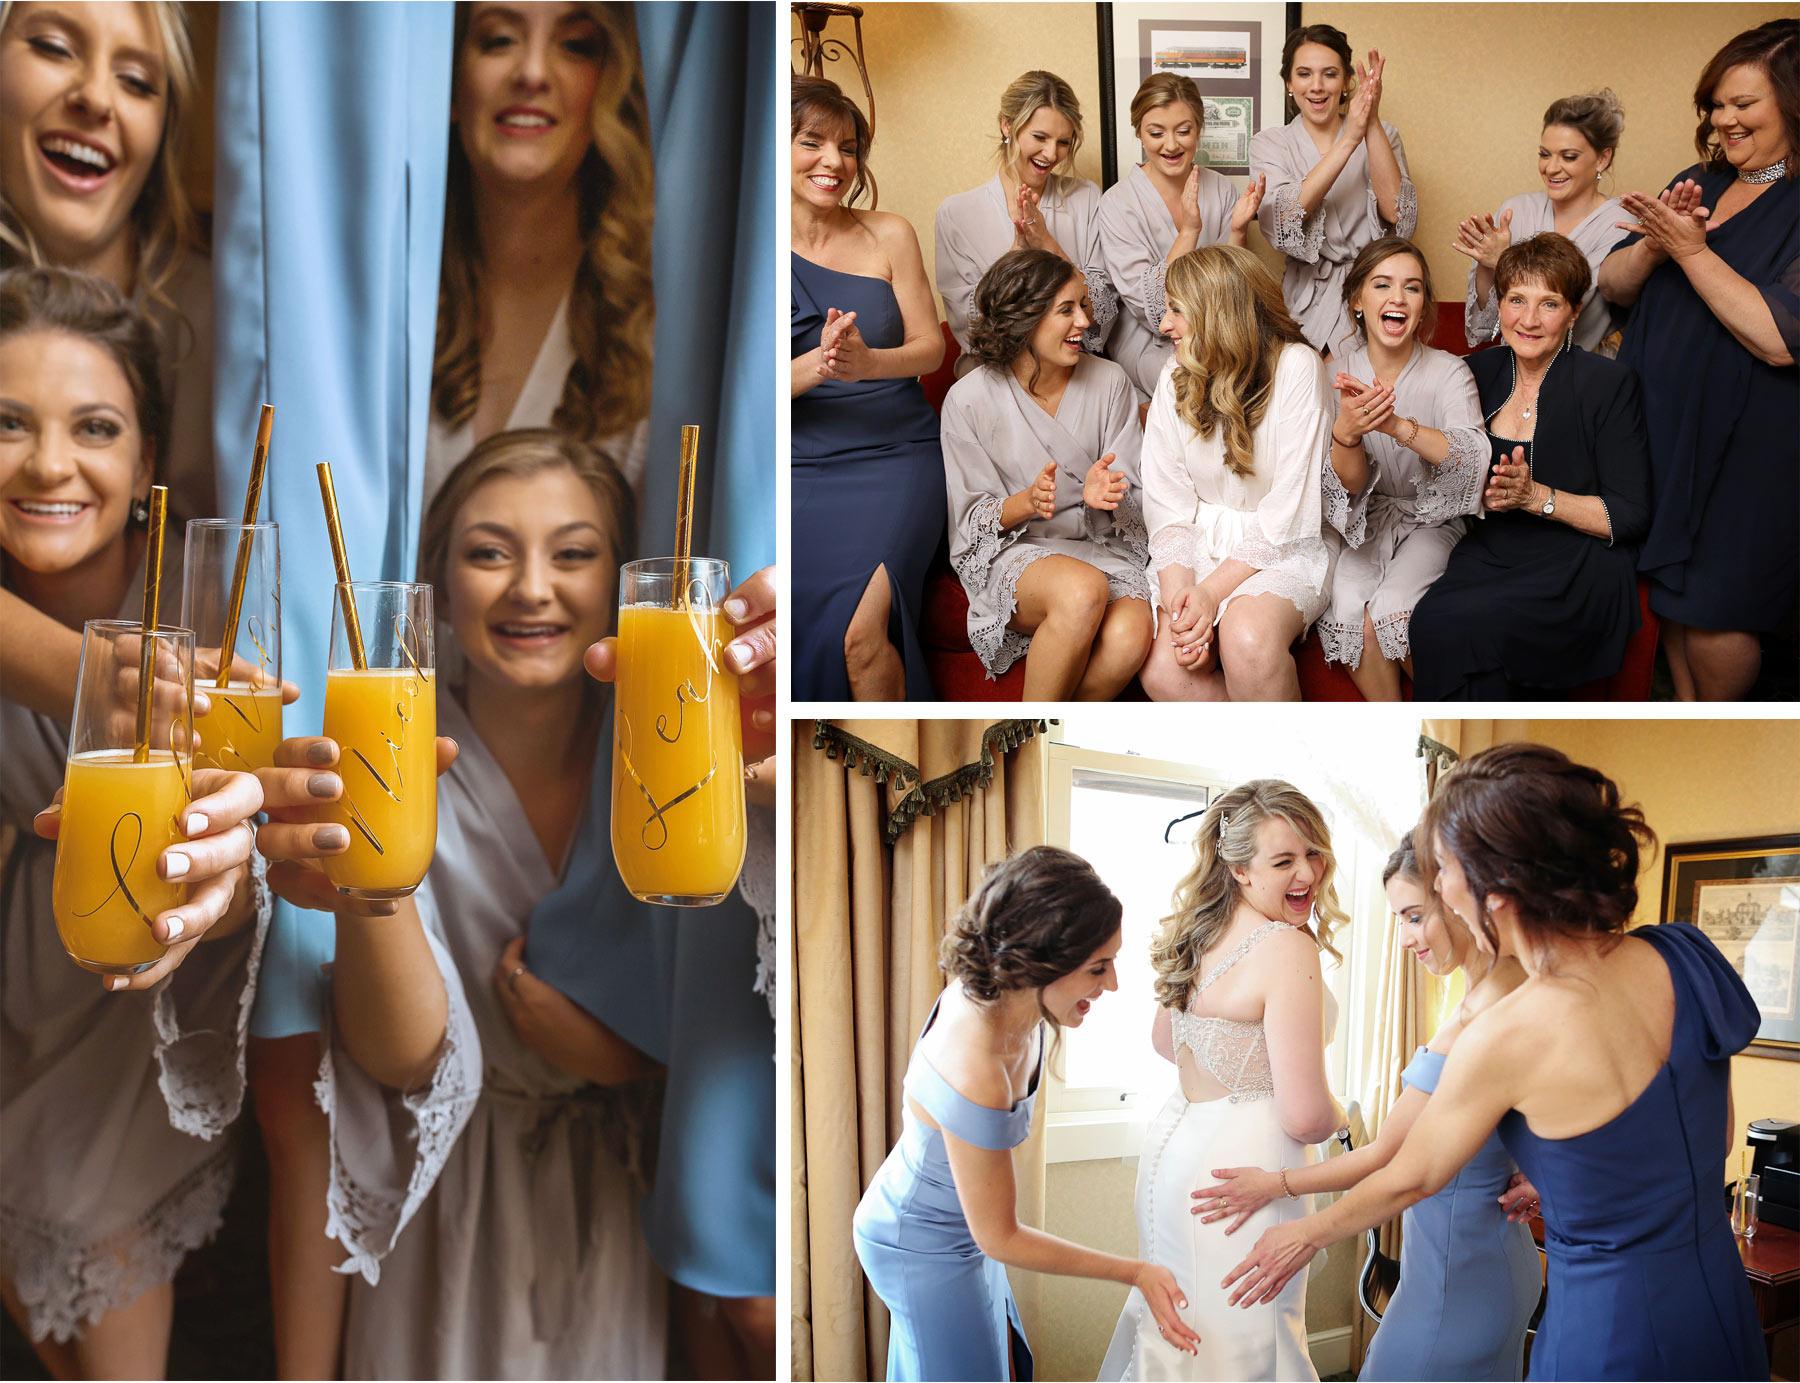 02-Minneapolis-Minnesota-Wedding-Vick-Photography-The-Depot-Bridesmaid-Dresses-Mimosas-Personalized-Cups-Amelia-and-Alexander.jpg